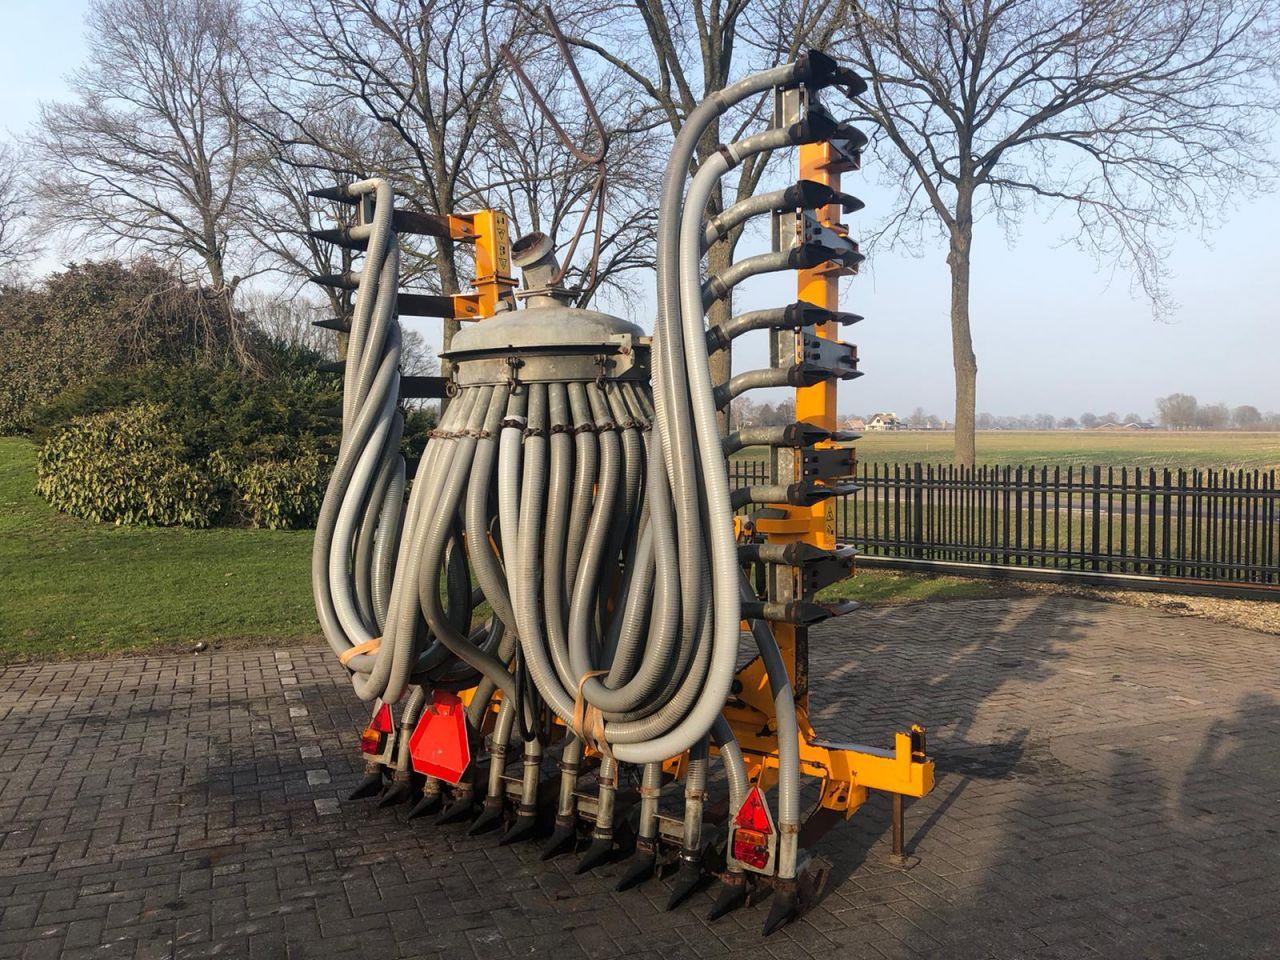 Veenhuis Euroject 806/32 sleepvoetbemester